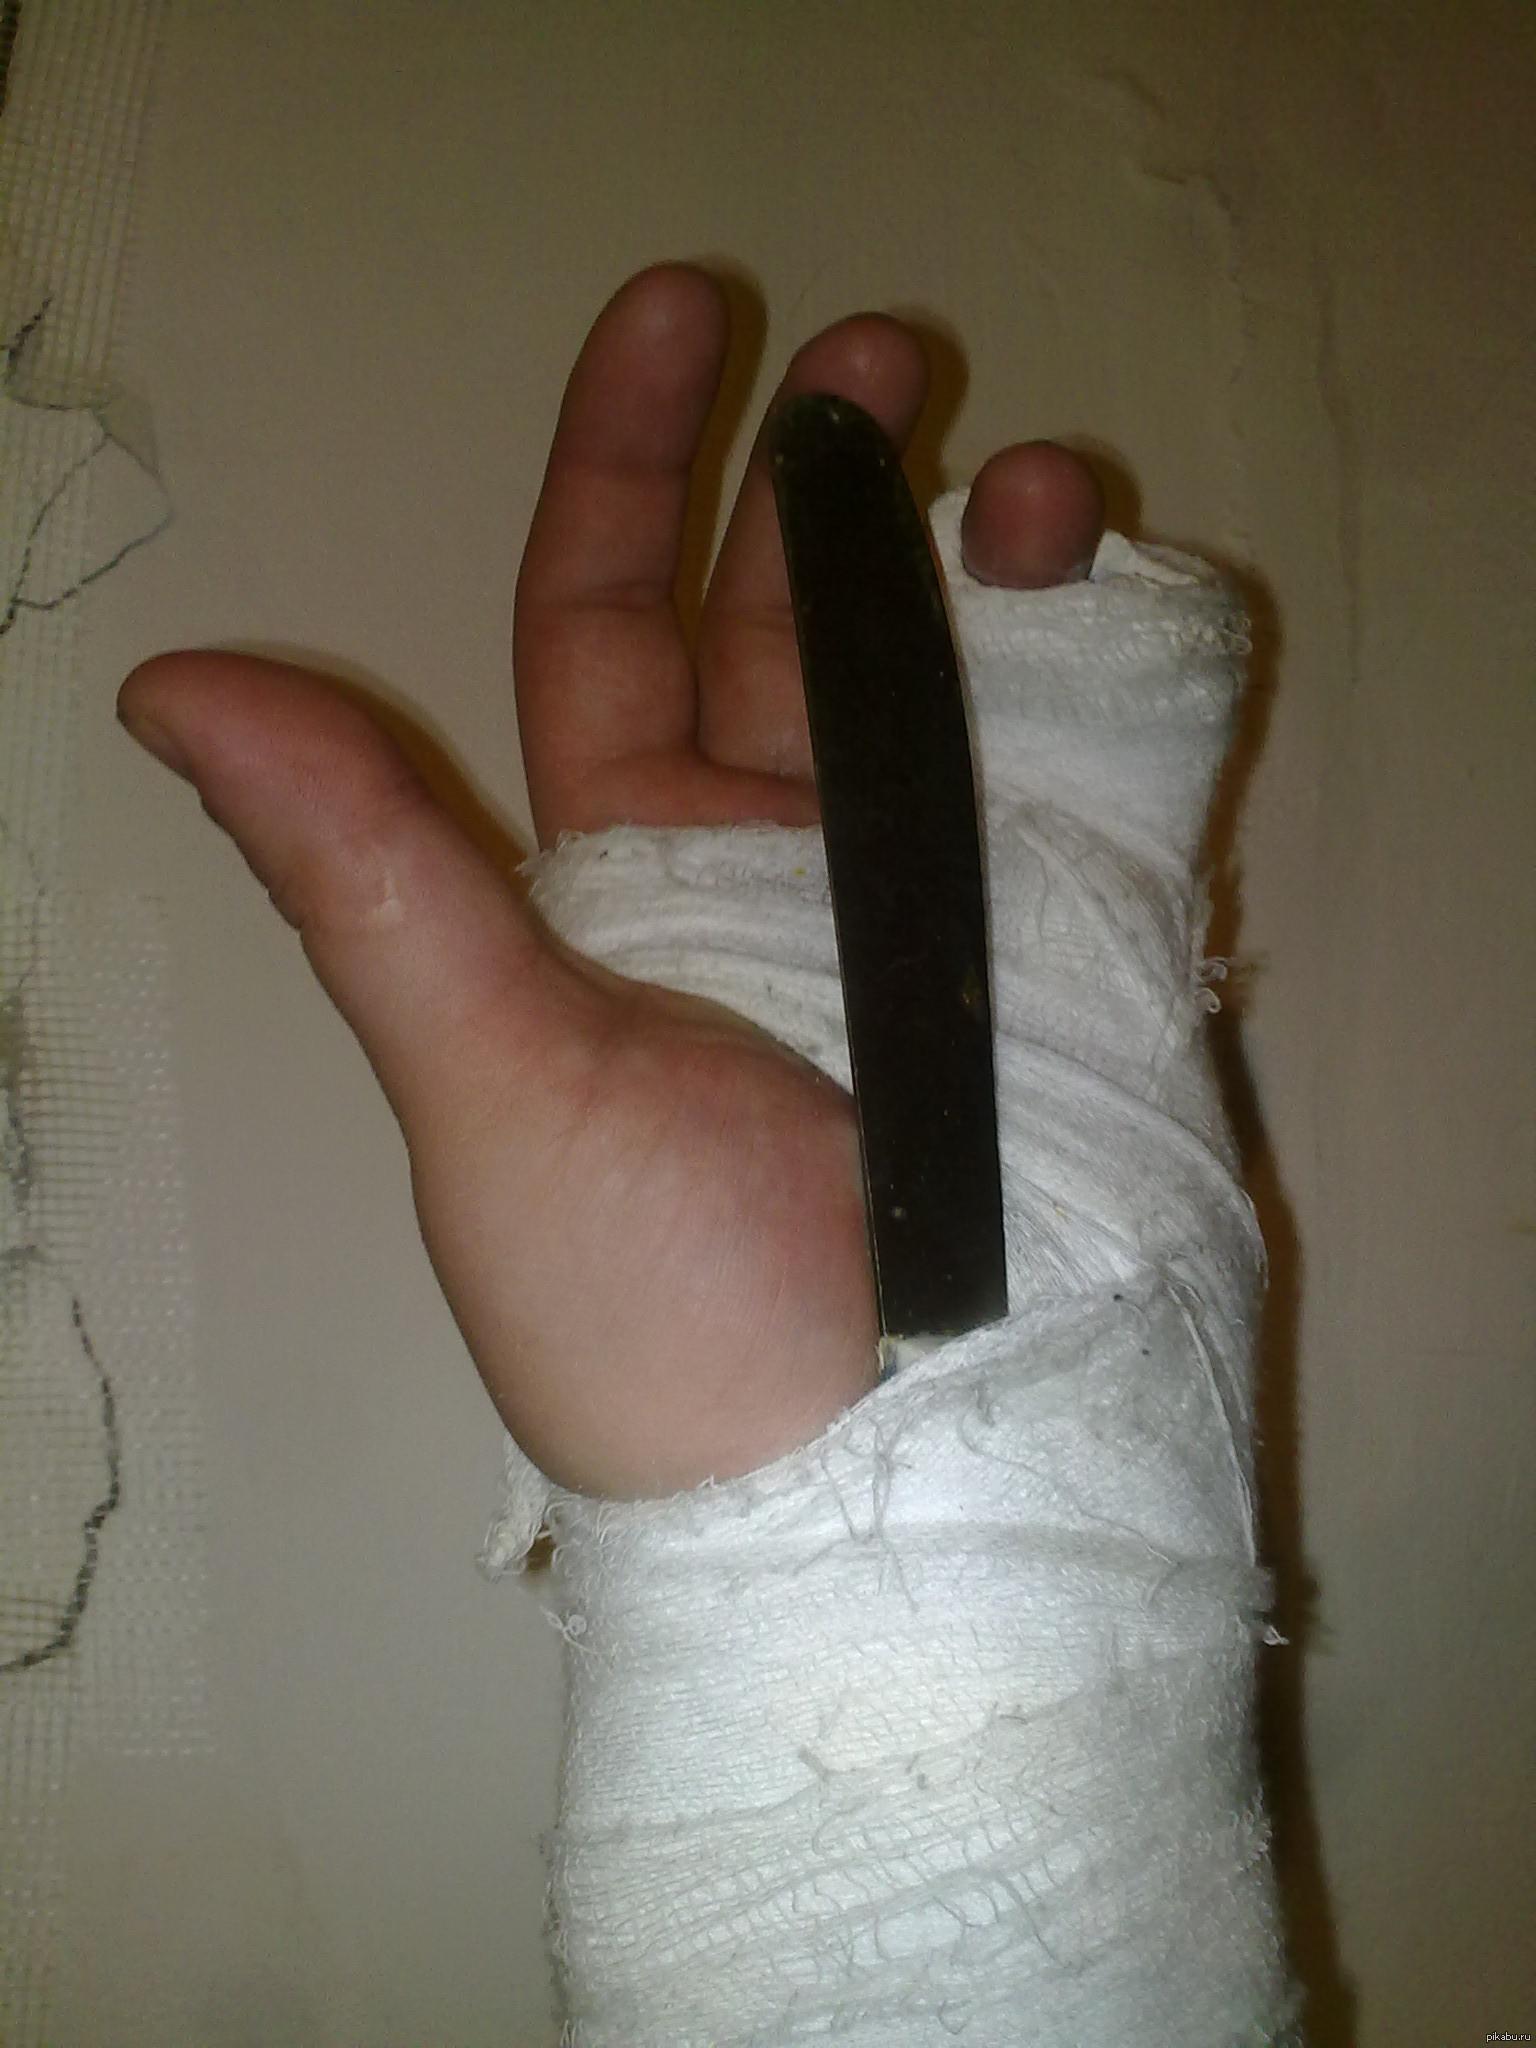 Я сломал руку картинки